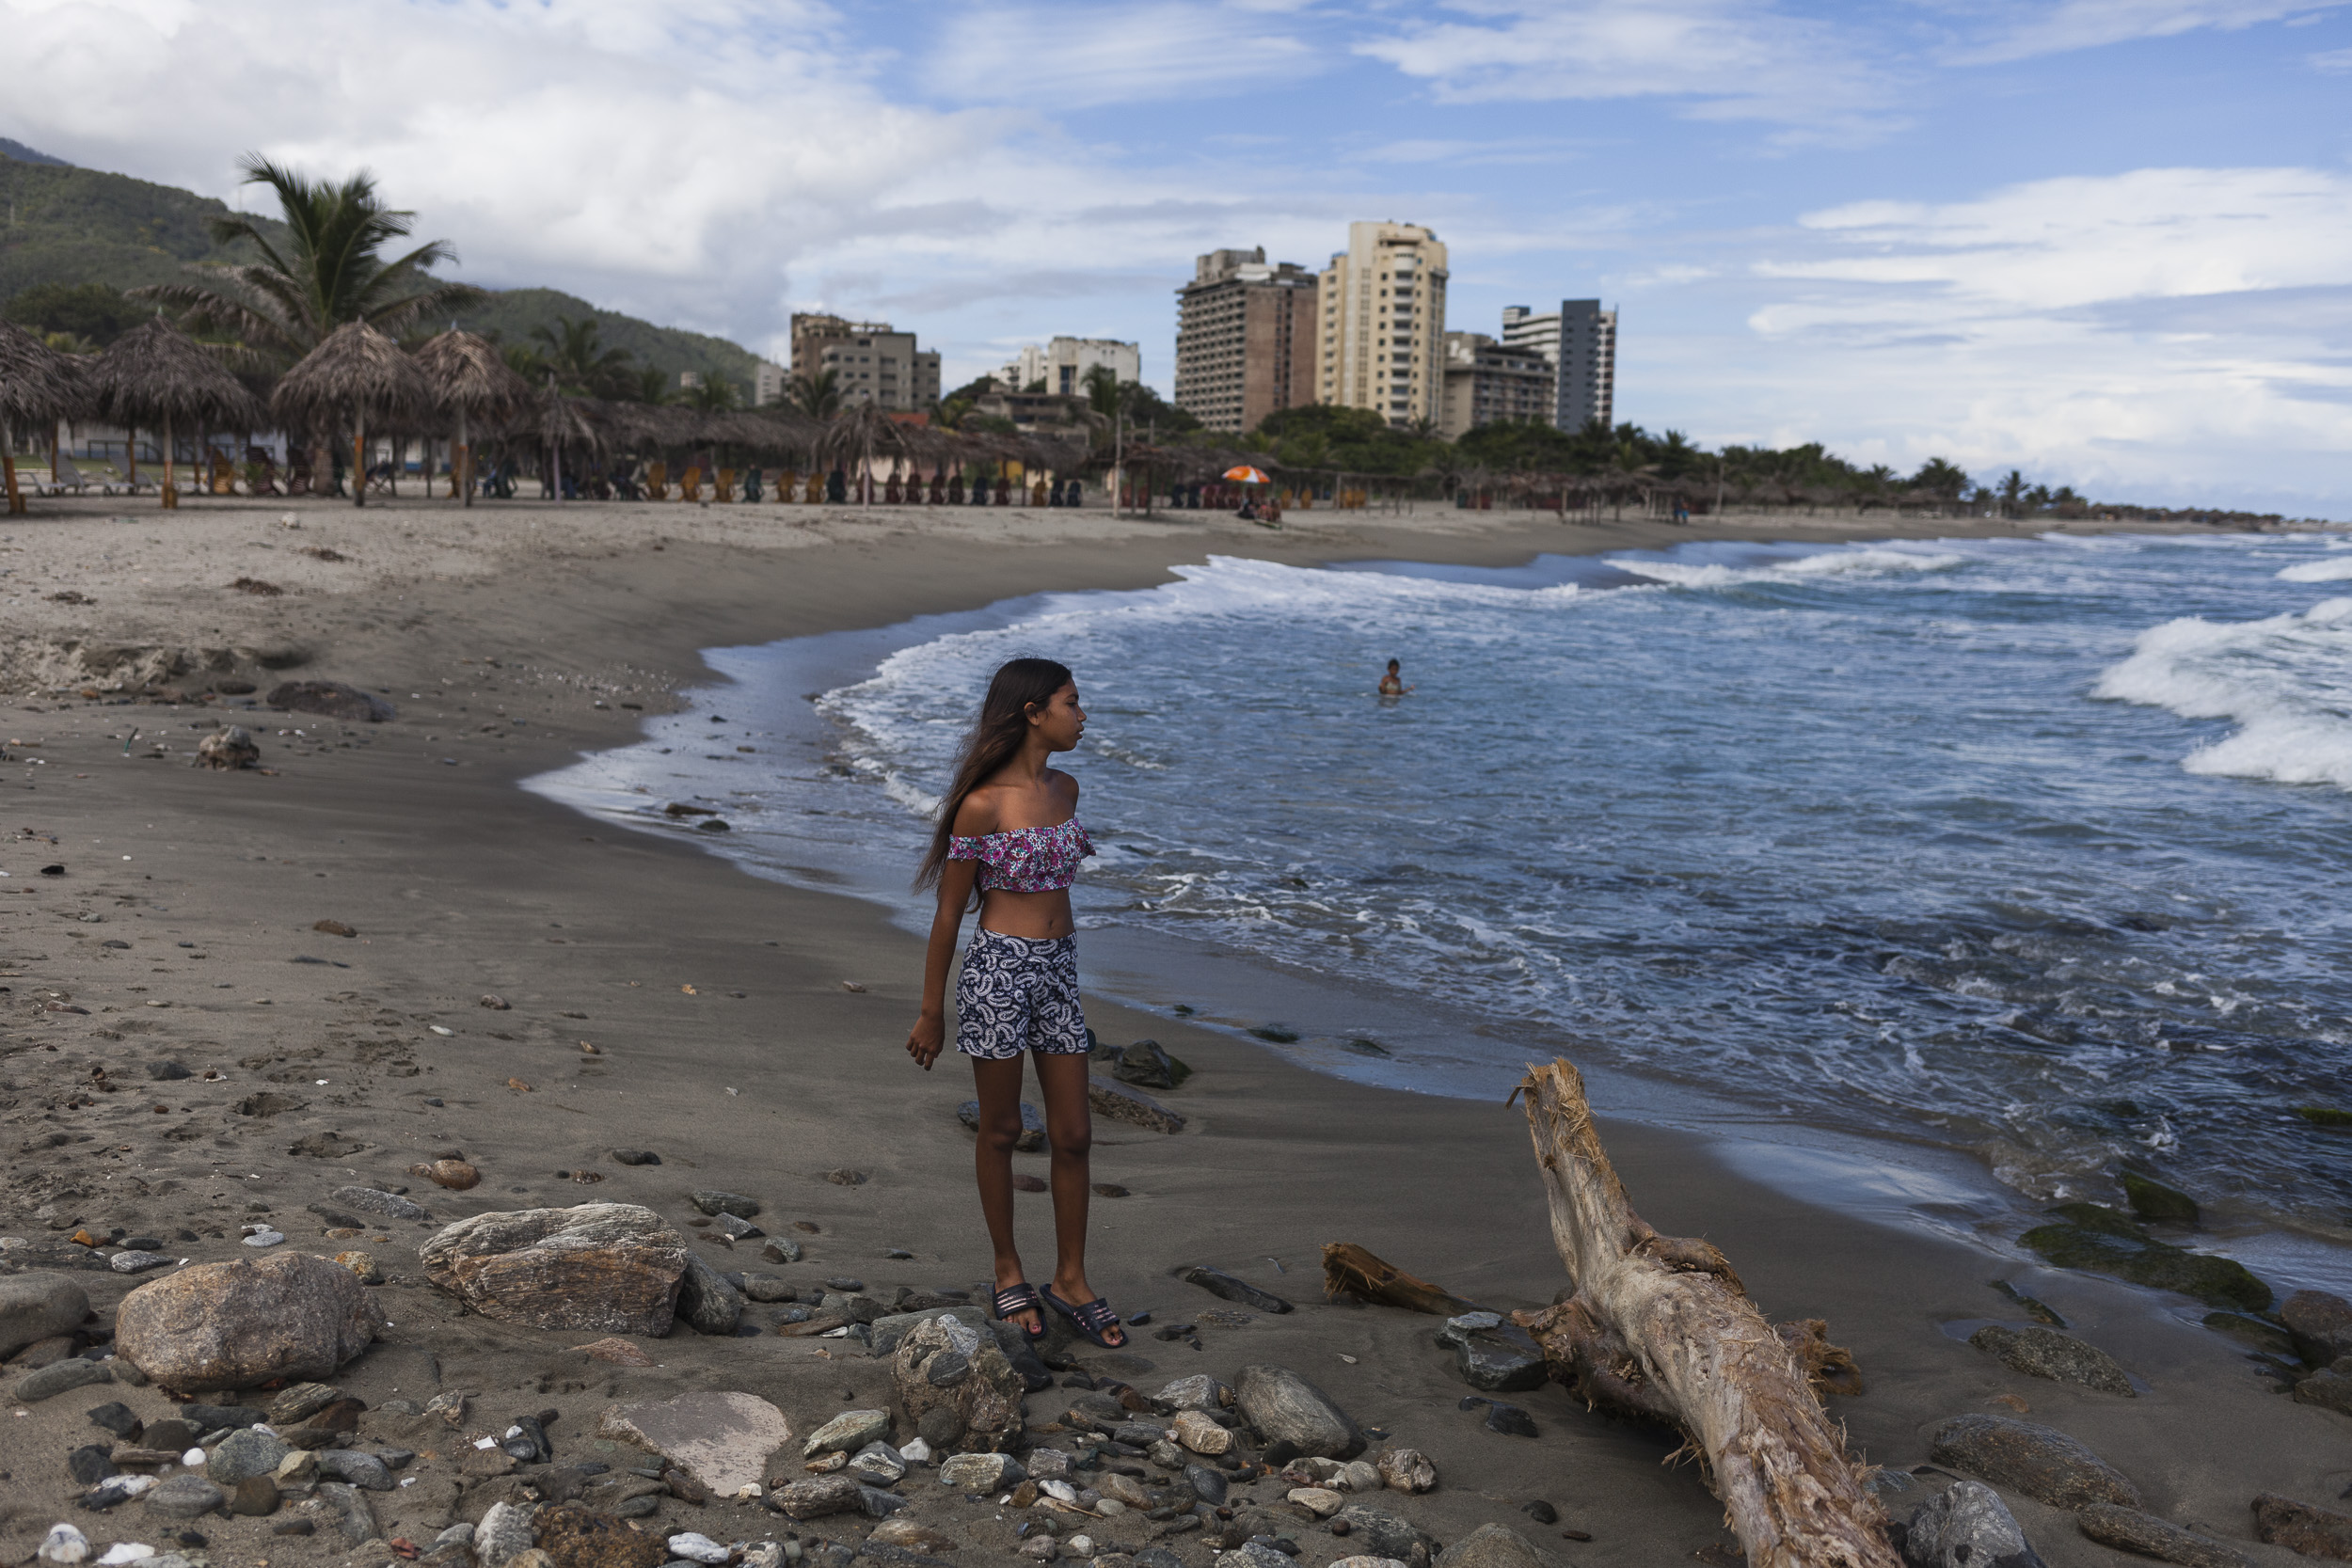 Mileska, 13, looks at the sea in Vargas, Venezuela.